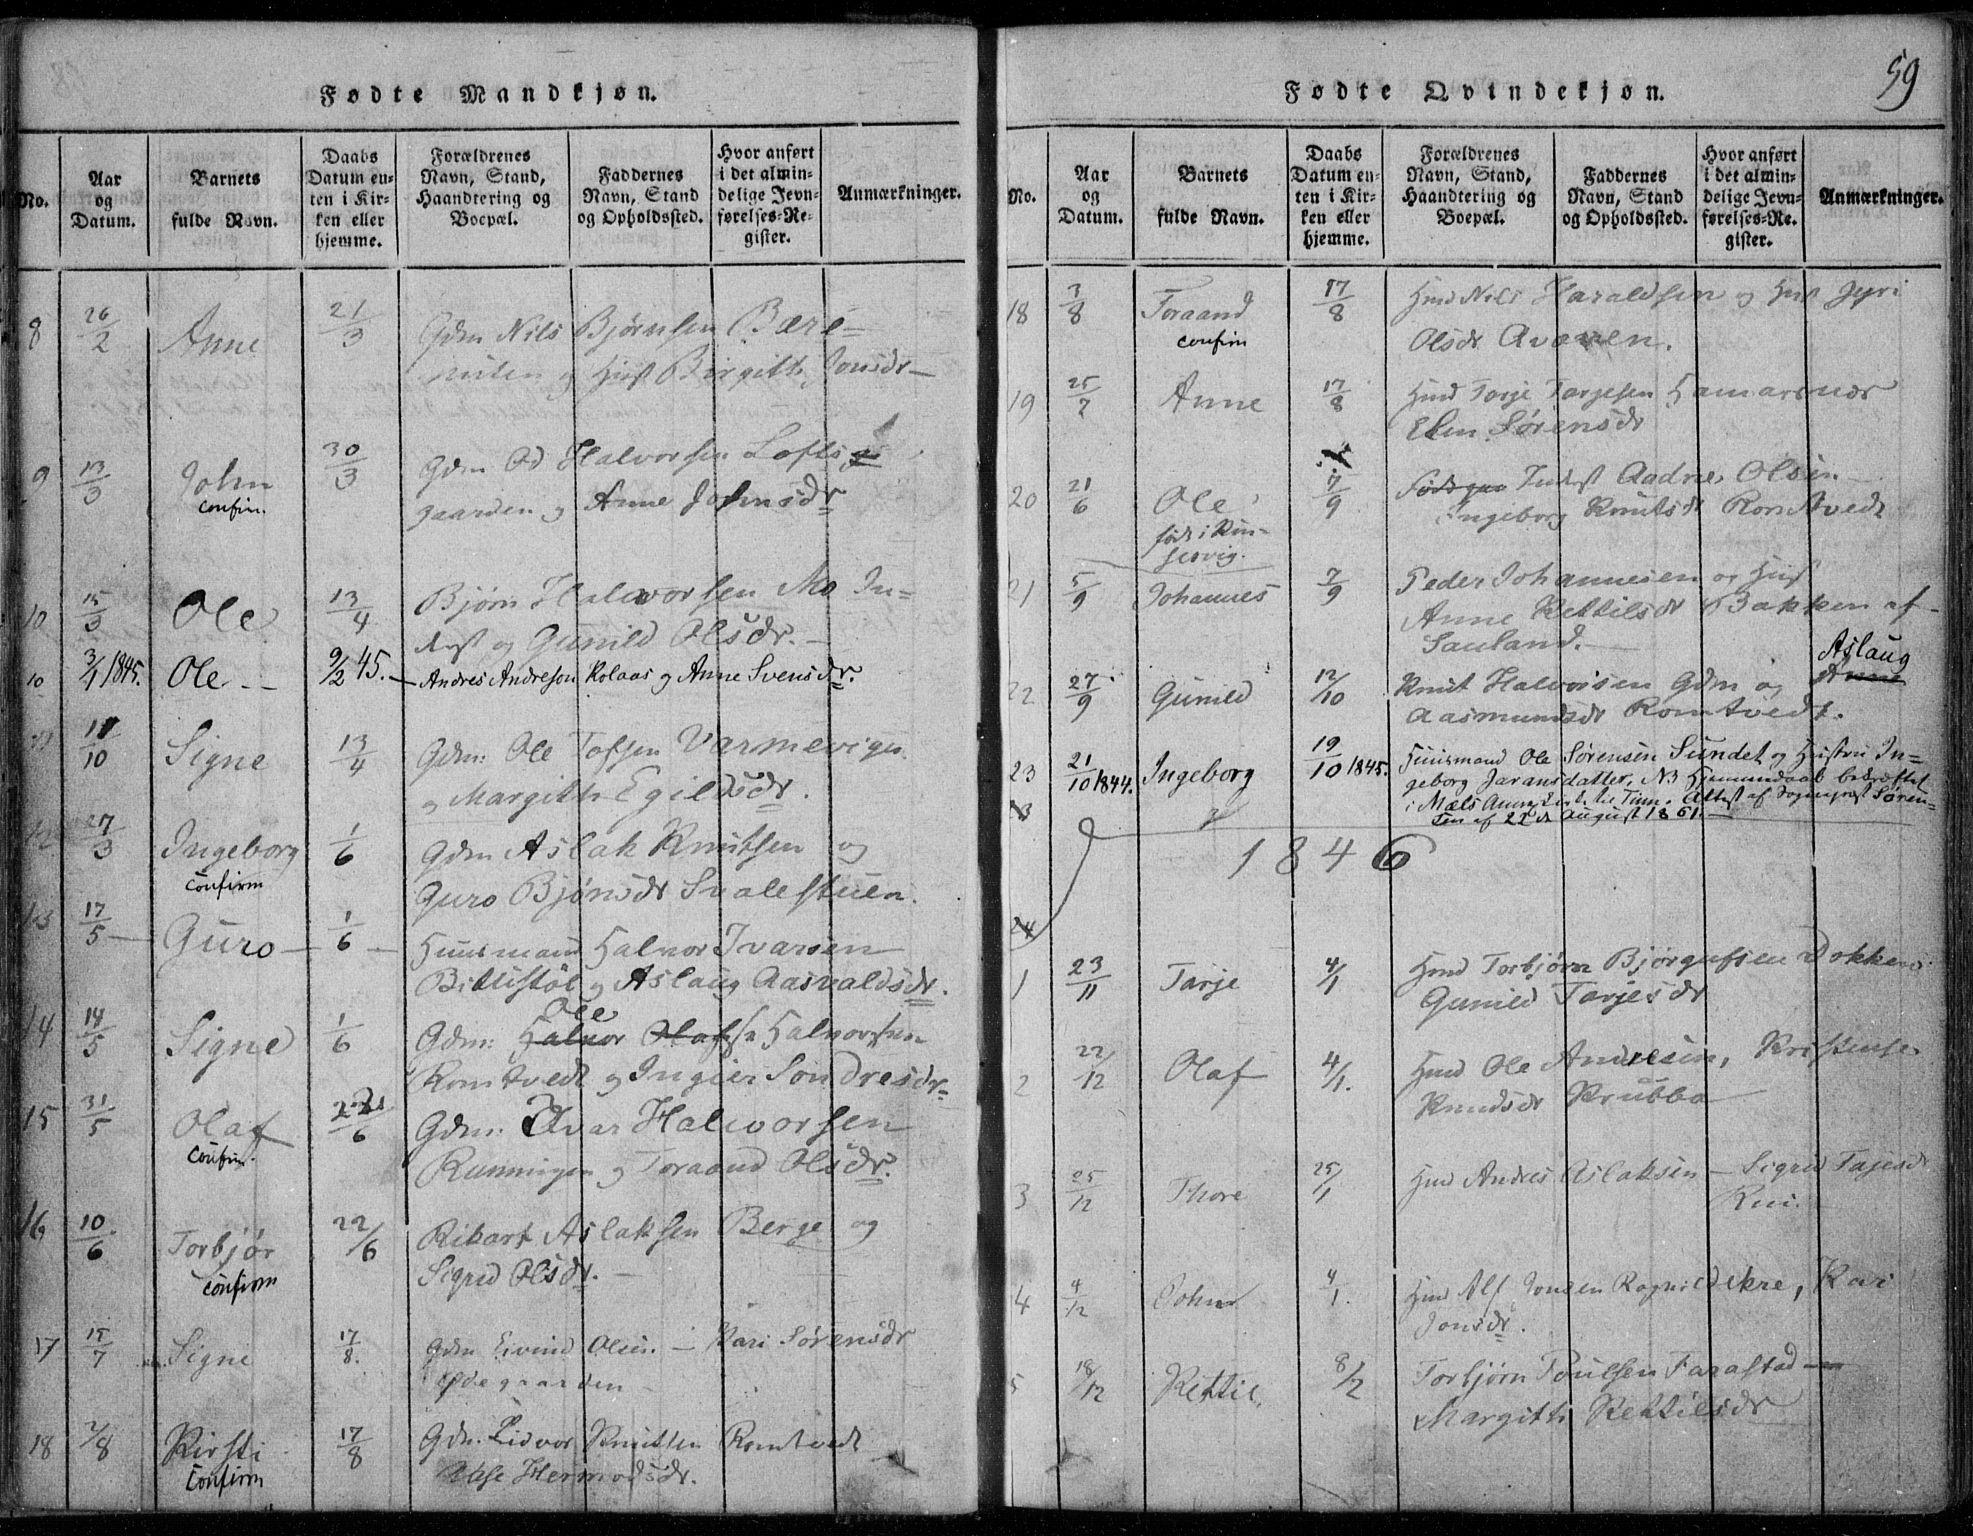 SAKO, Rauland kirkebøker, F/Fa/L0001: Ministerialbok nr. 1, 1814-1859, s. 59